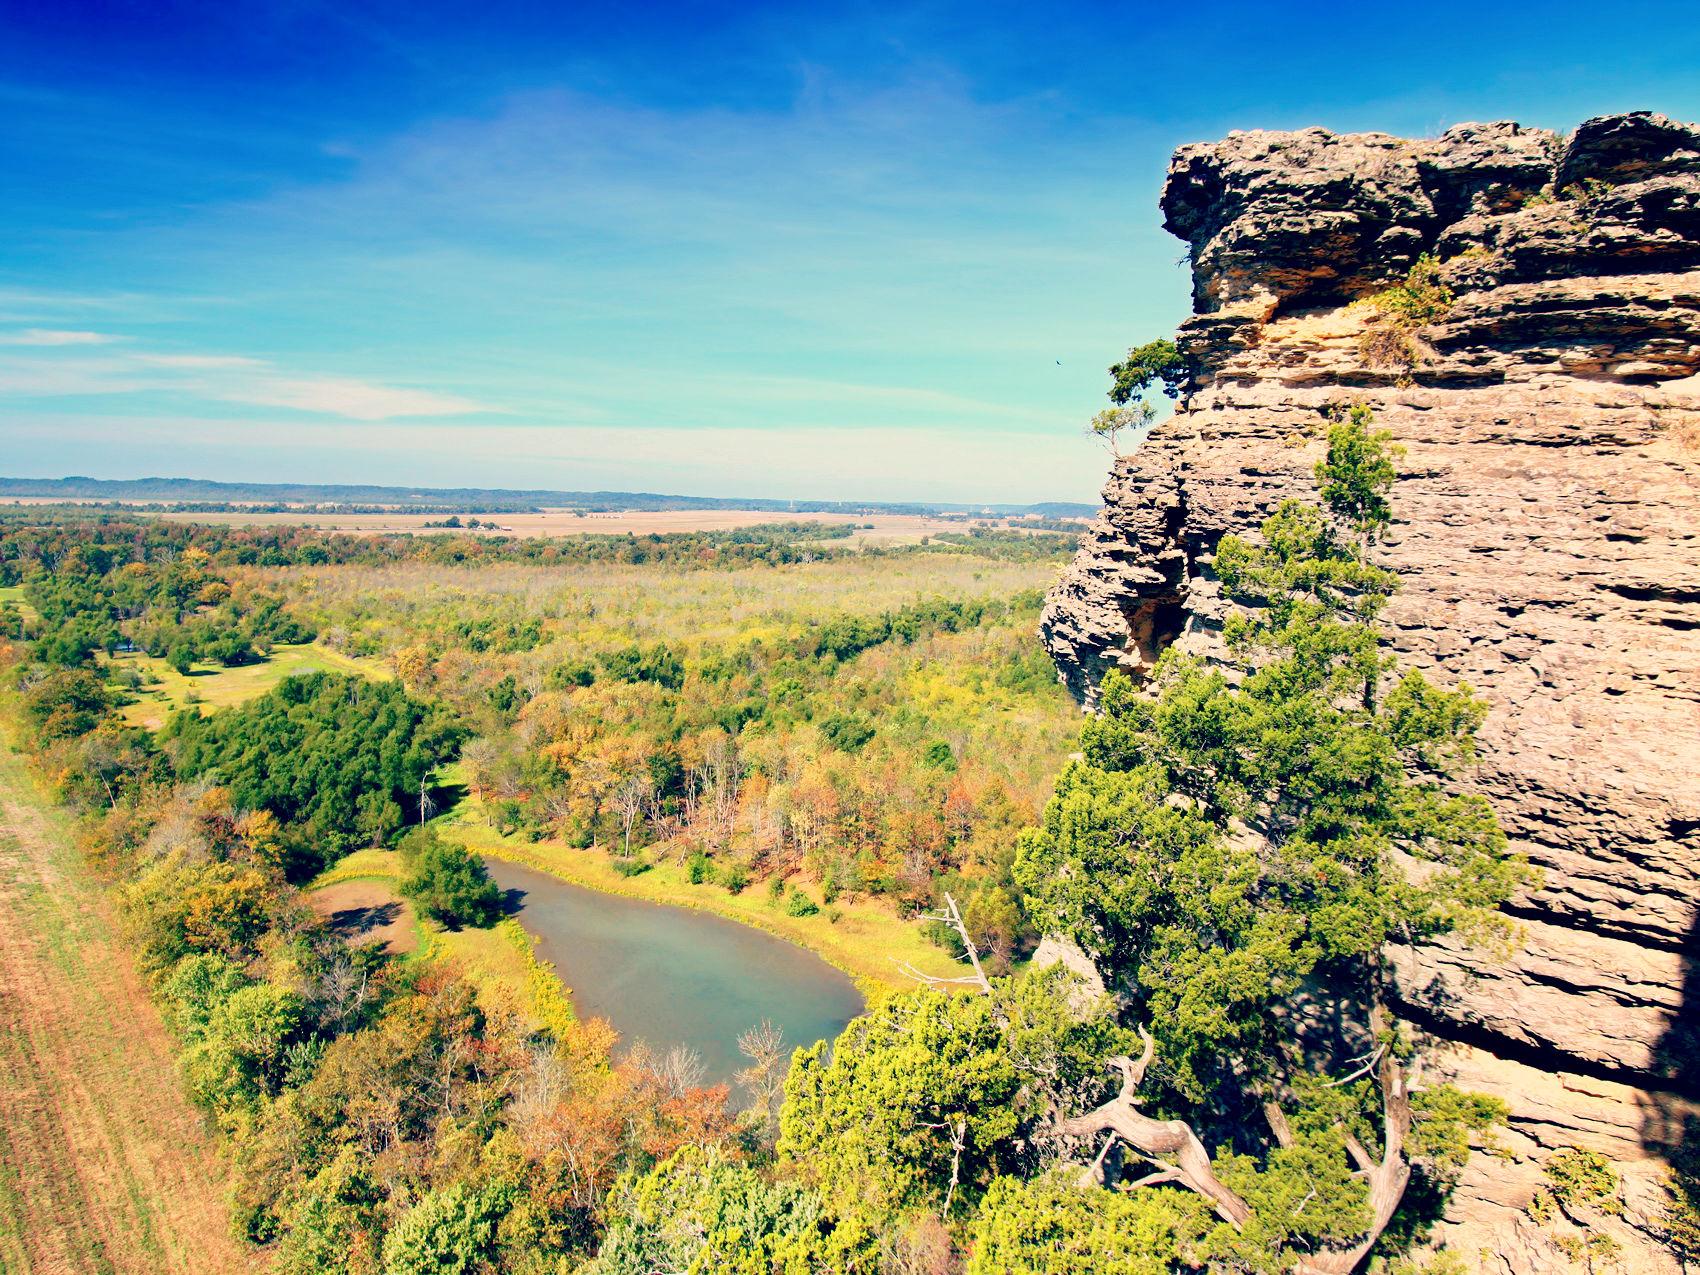 Inspiration Point, Shawnee Forest